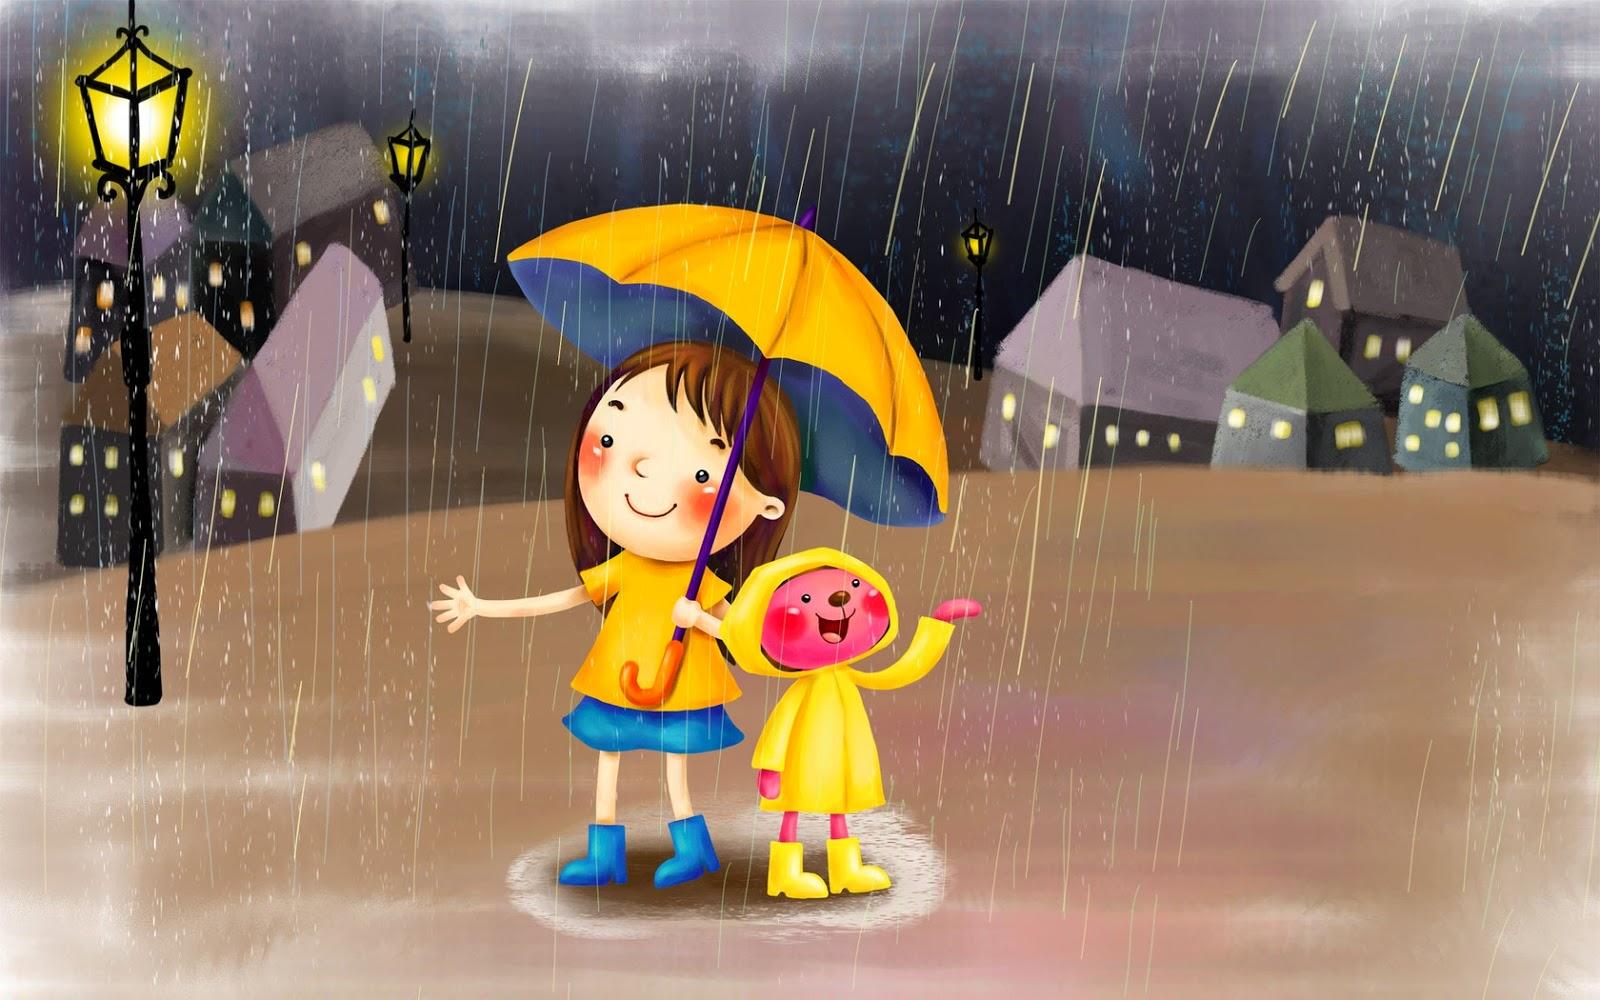 Gambar Hujan Kartun Lucu Animasi Hujan Lebat Bergerak